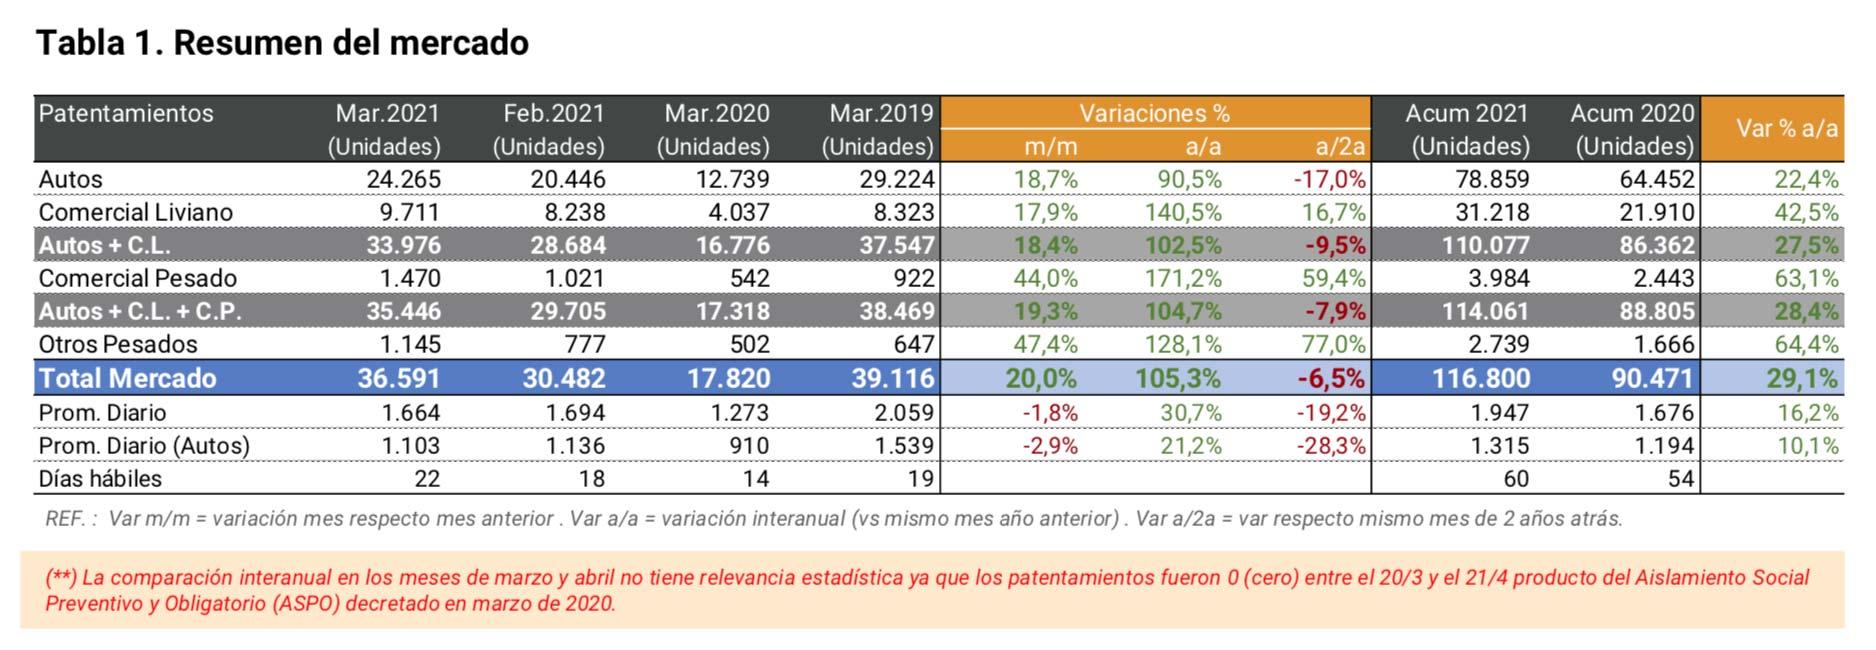 Patentamientos autos Argentina 2021